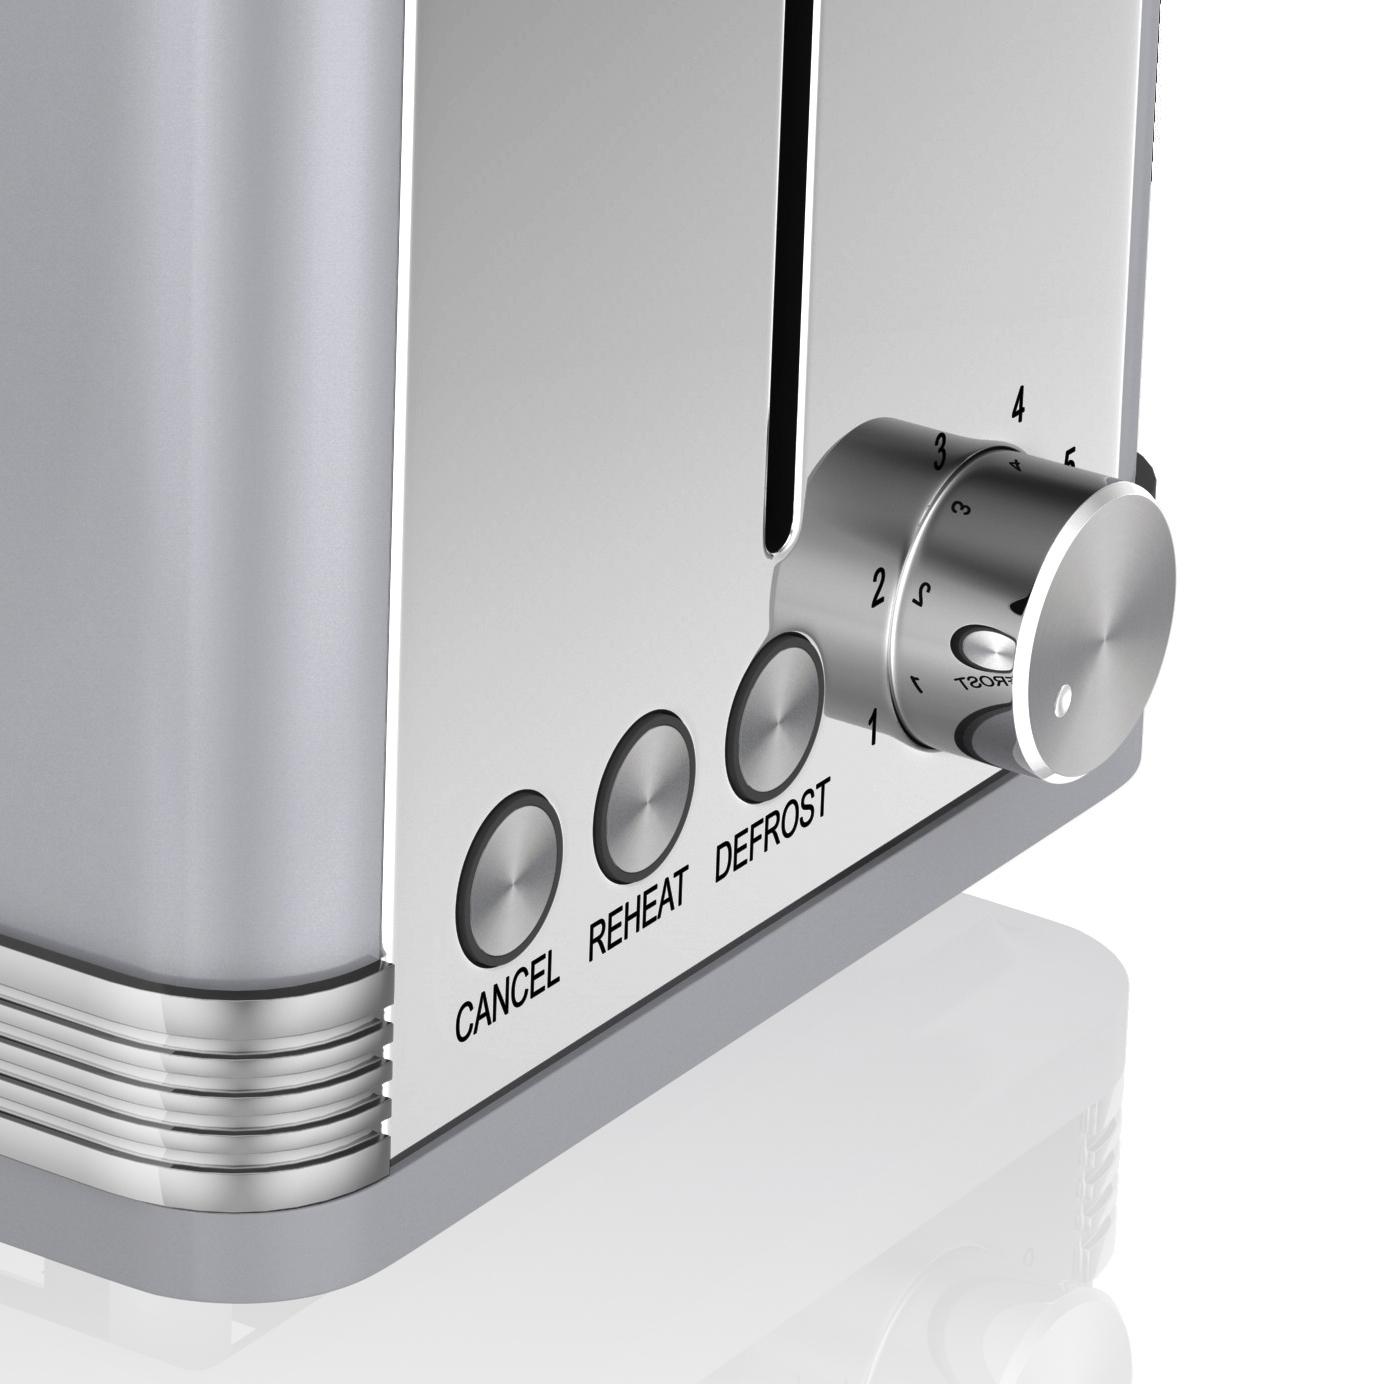 thumbnail 56 - Swan Retro 1.5L Jug Kettle 3KW, 2 Slice Toaster 815W & 20L Digital Microwave Set